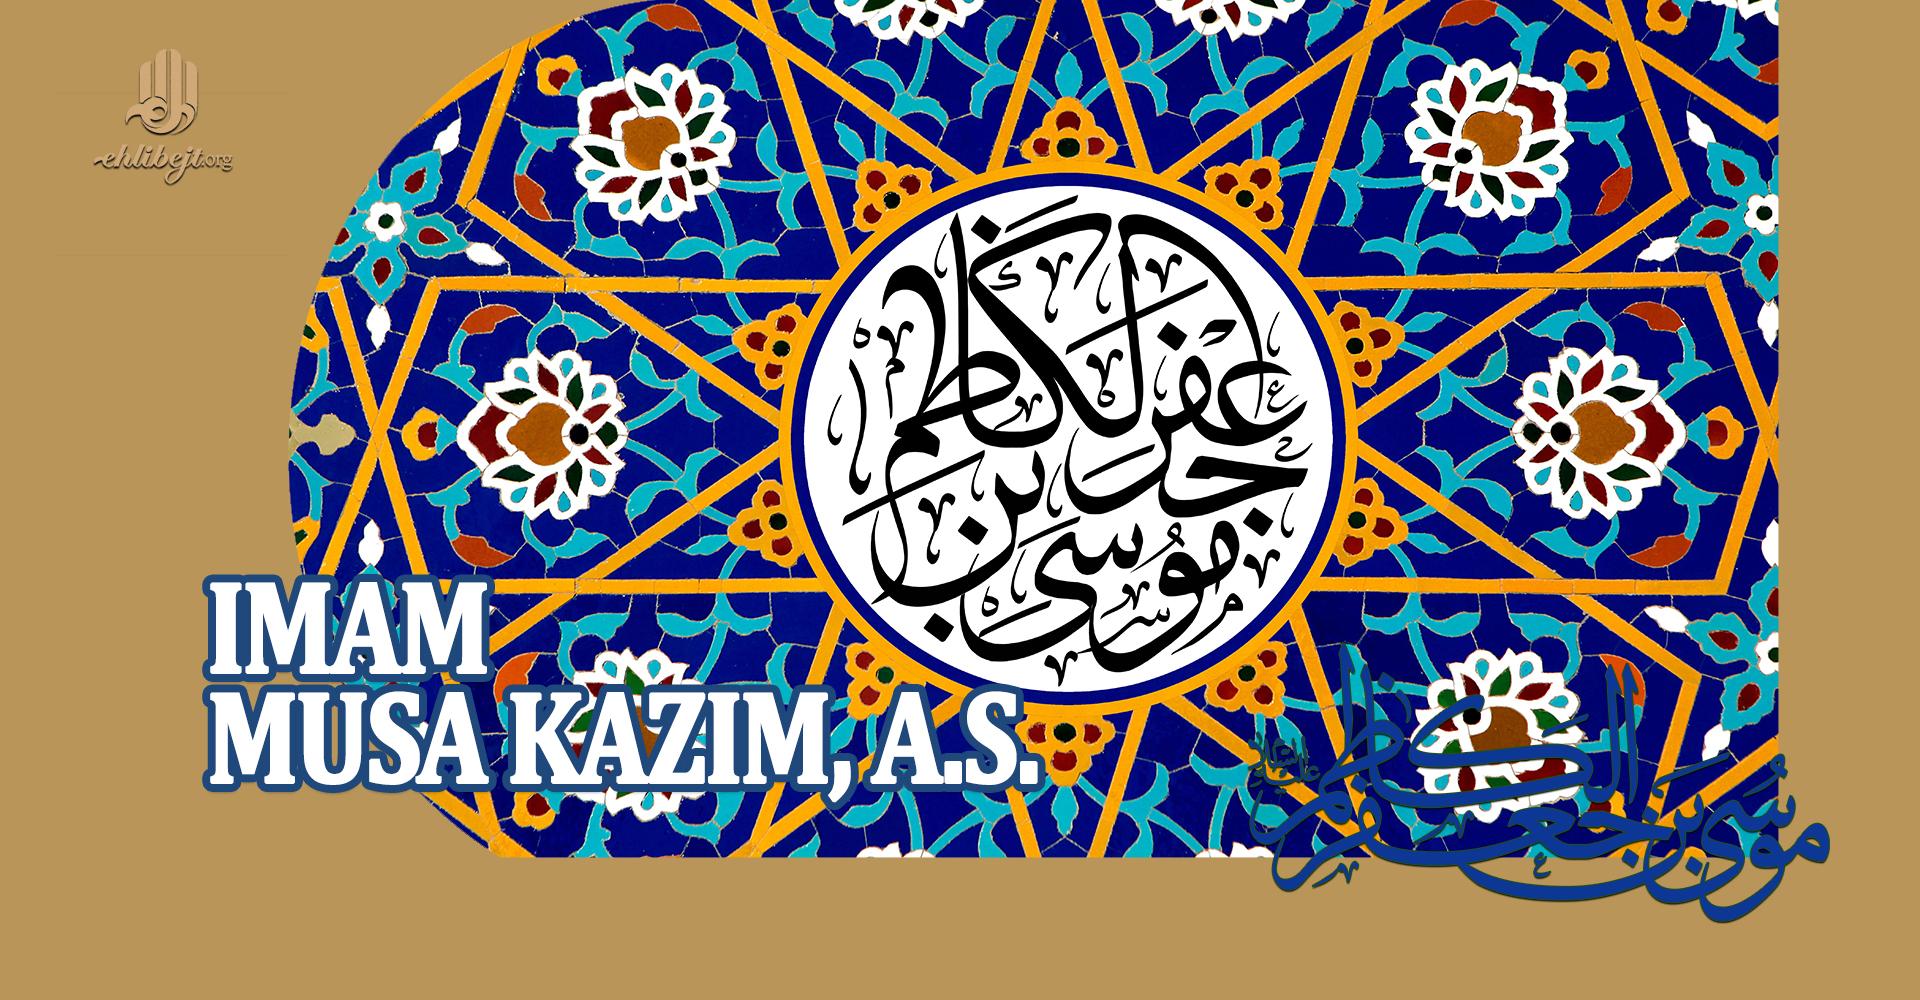 Imam Musa Kazim, a.s.